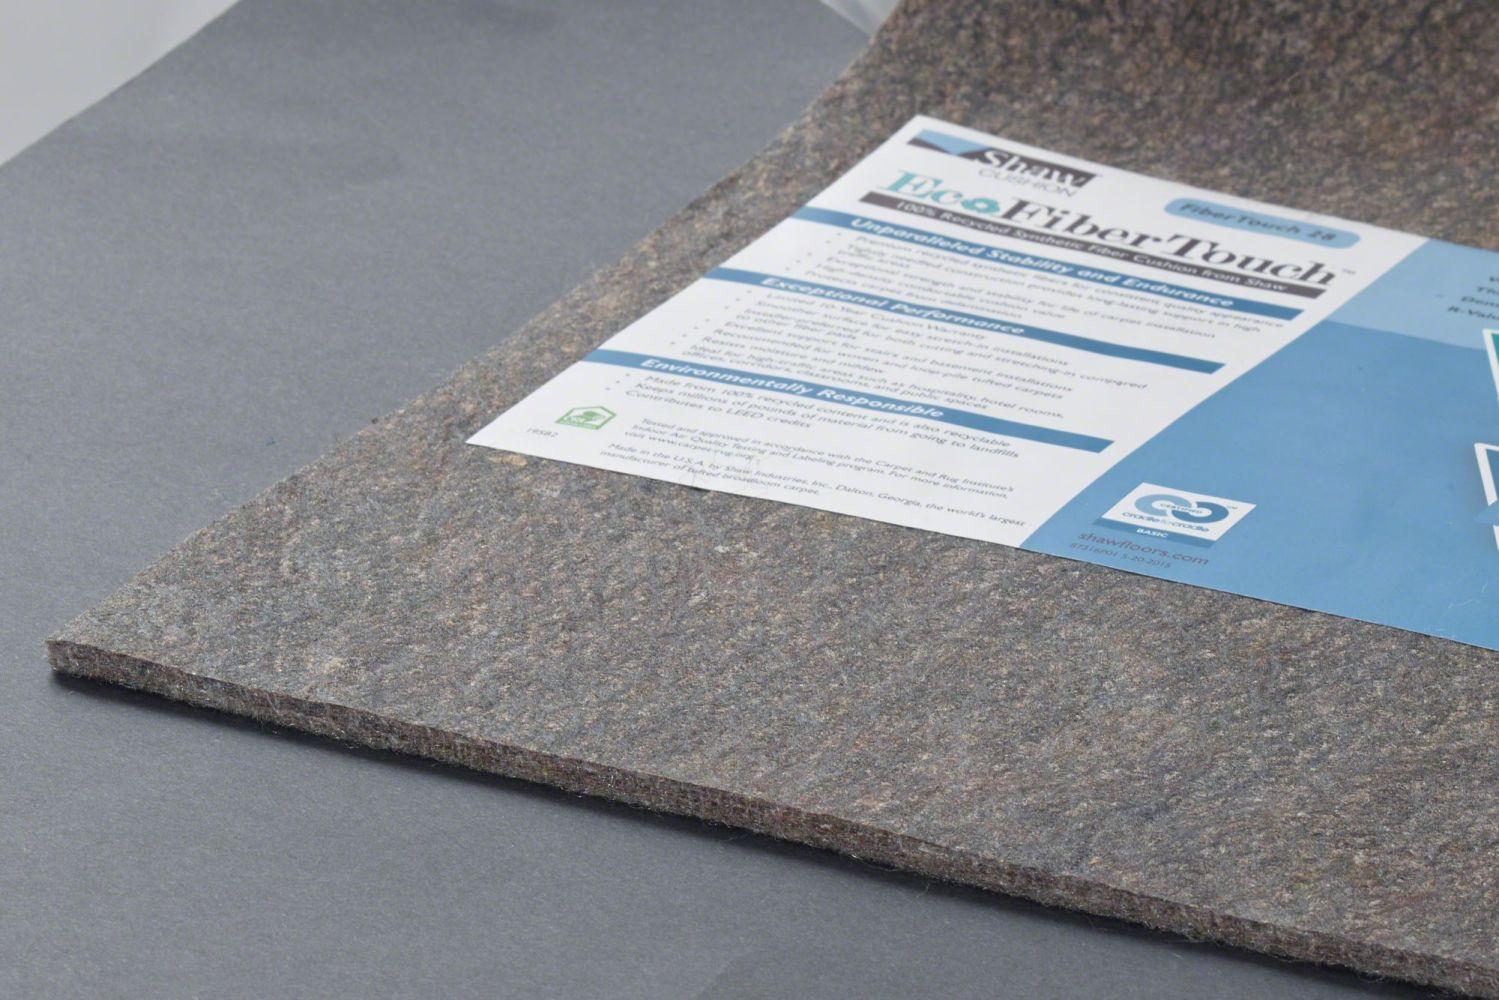 Philadelphia Commercial Eco Edge Cushion Fibertouch 28-6 Grey 00001_302FT